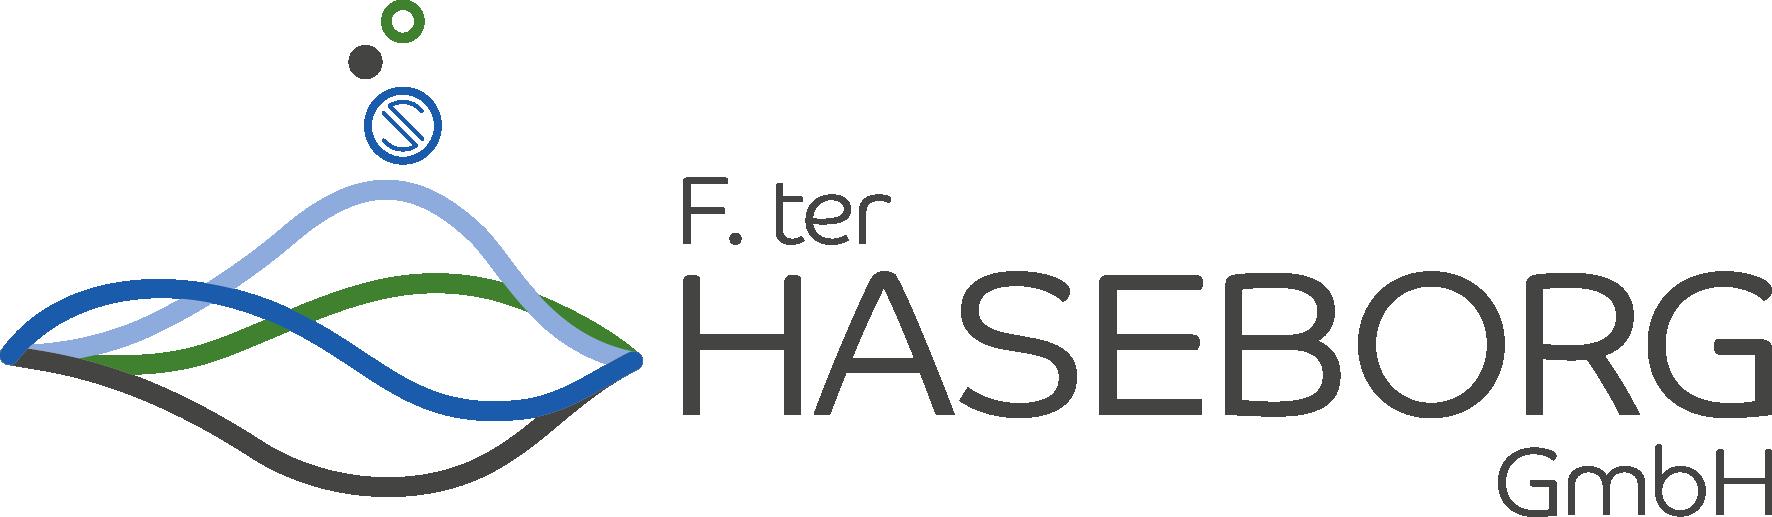 ter-haseborg